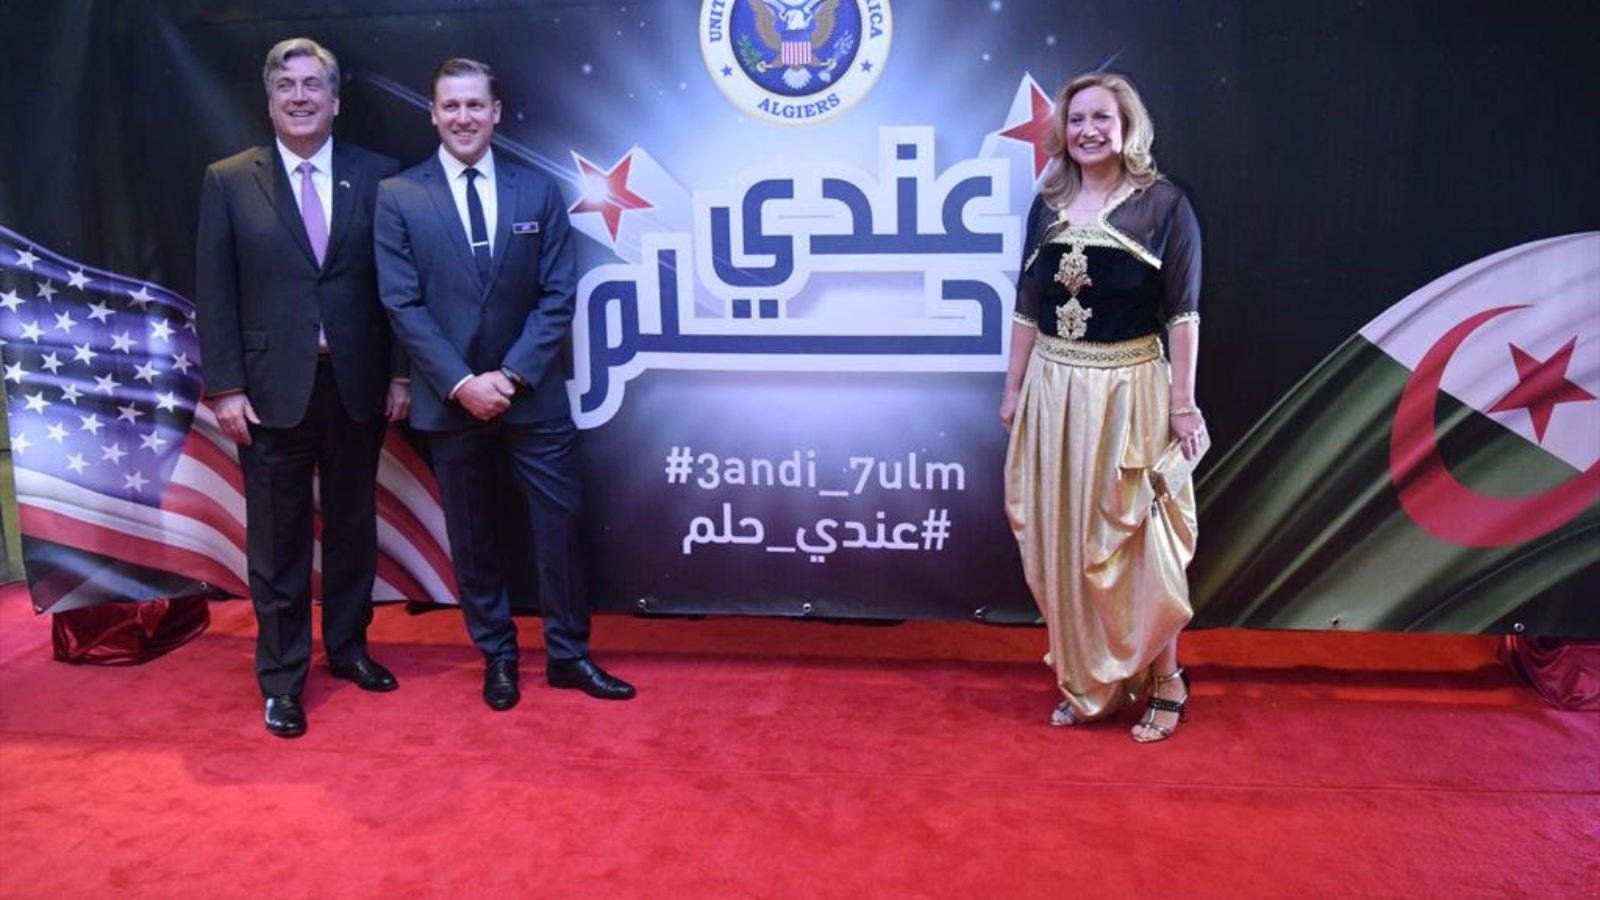 Georgetown alums U.S. Ambassador John P. Desrocher and Andrew Farrand with Karen Rose